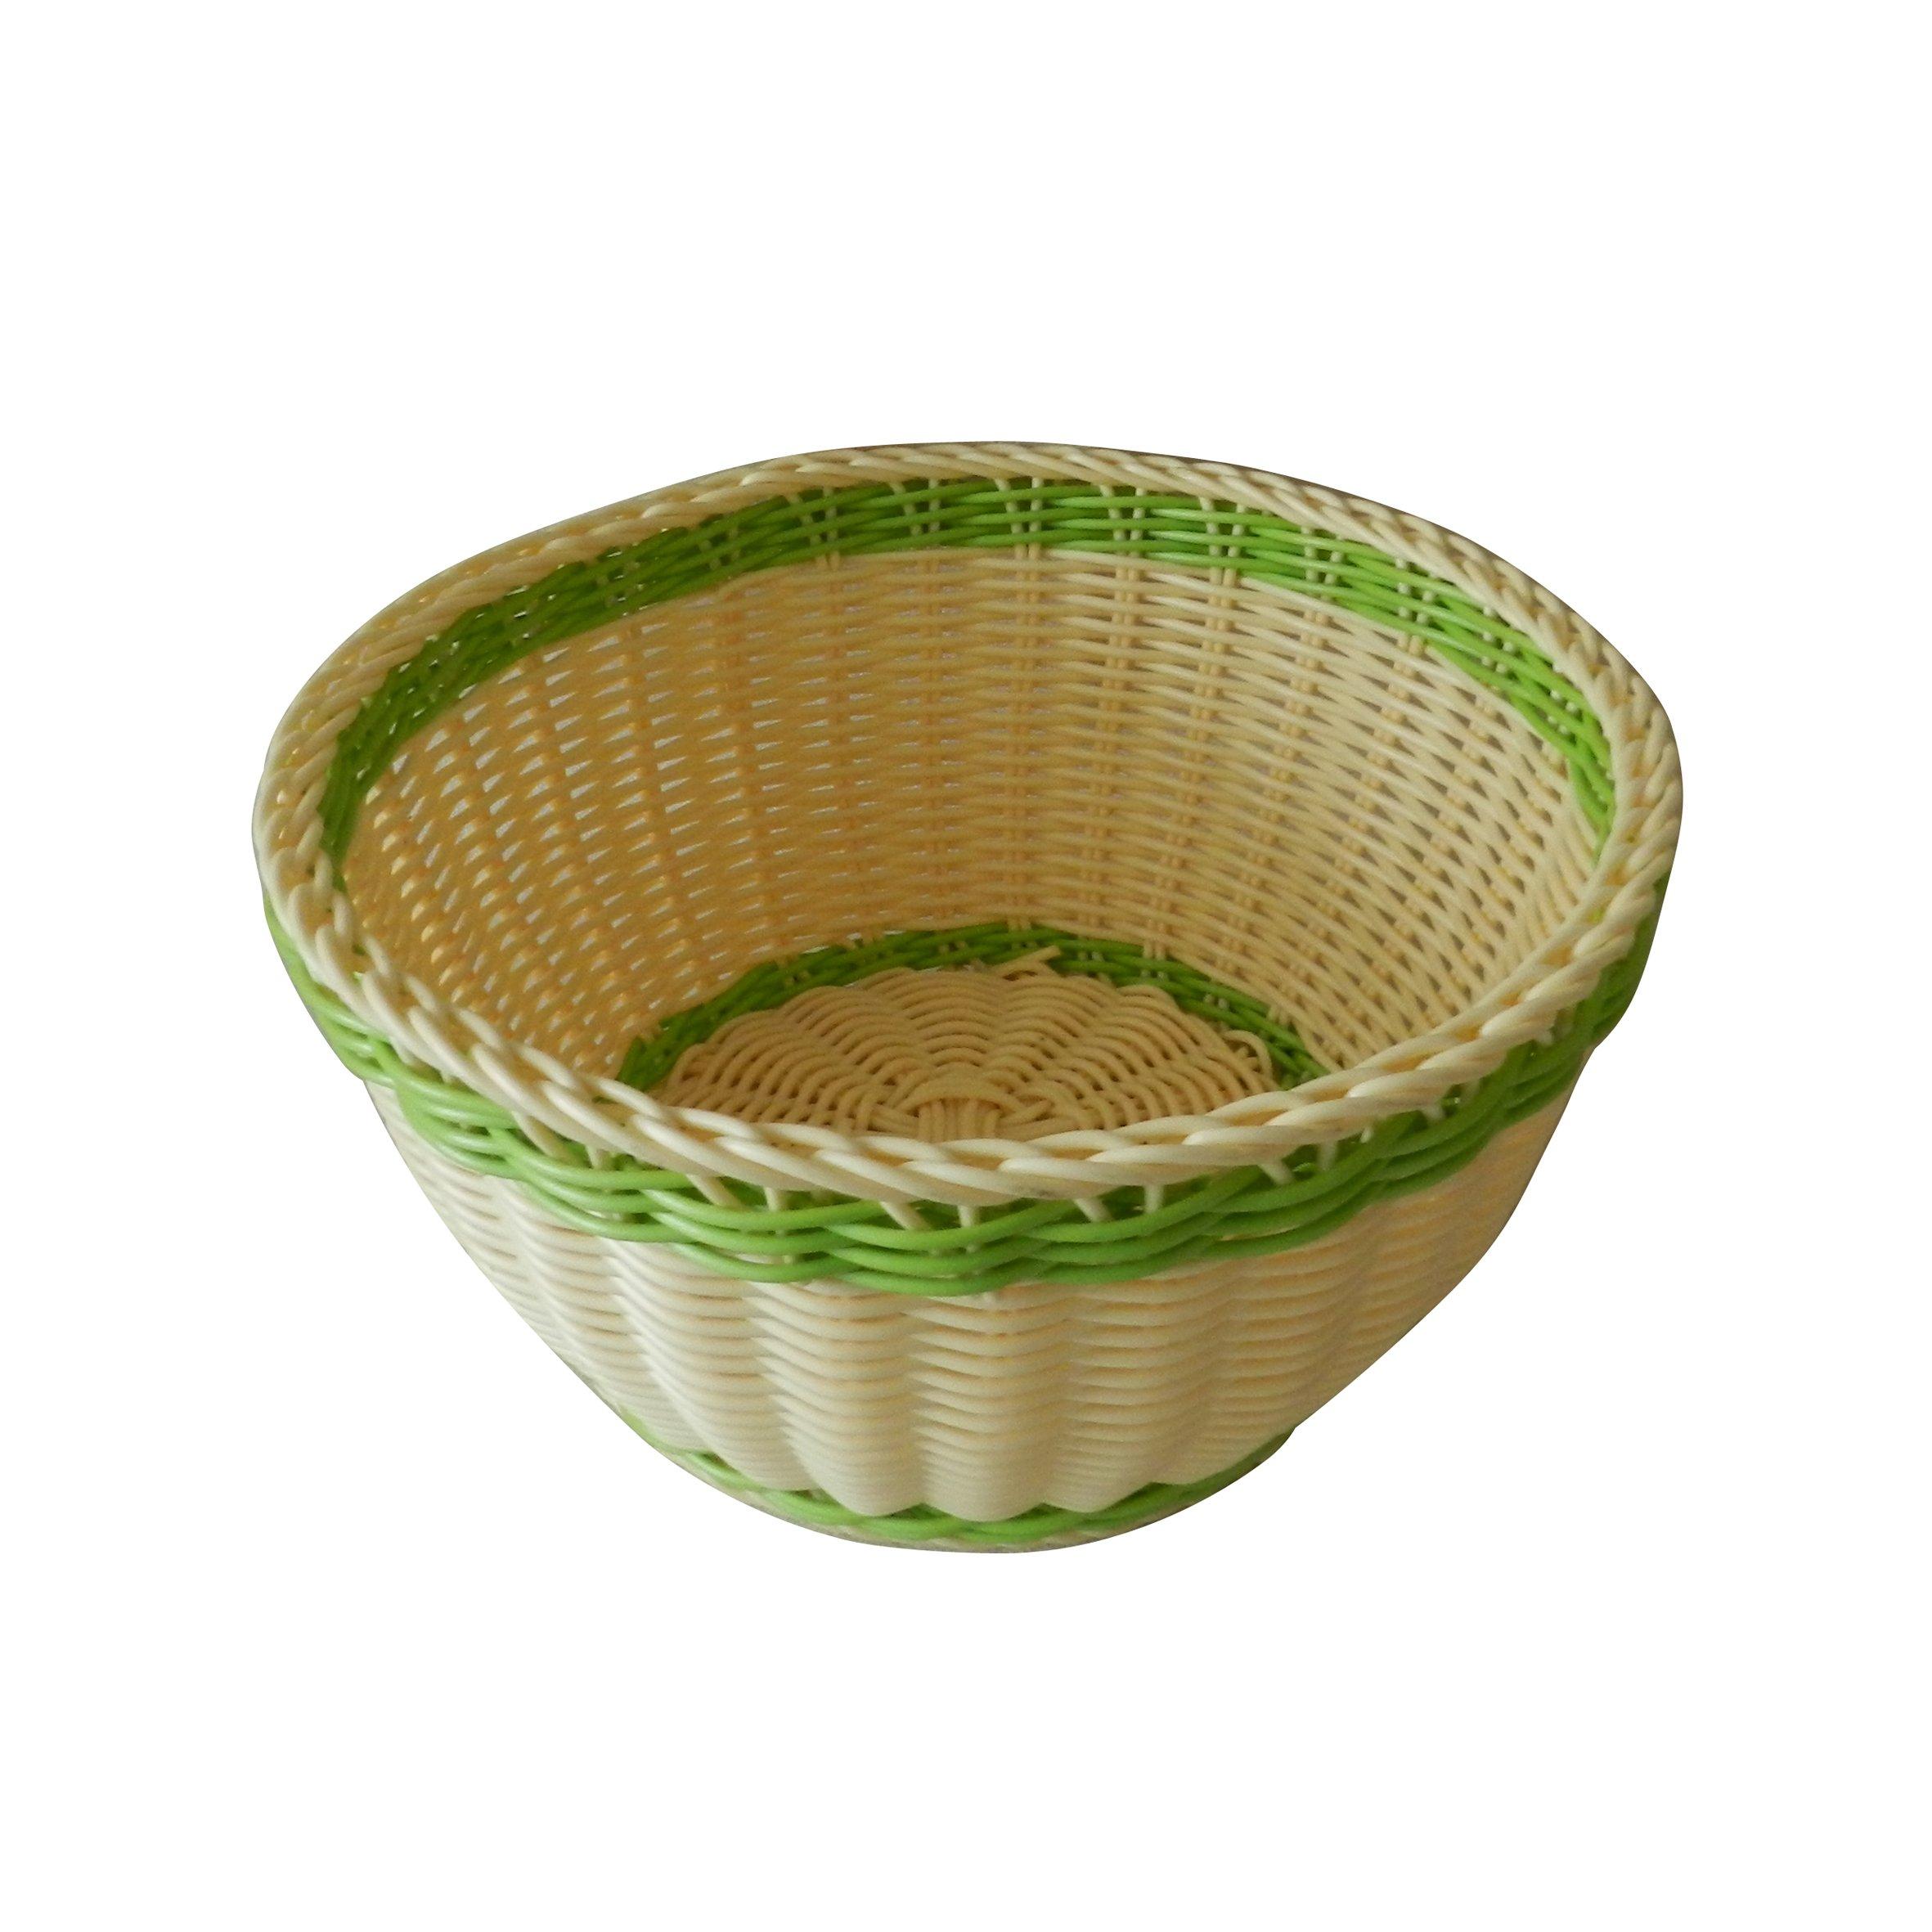 CVHOMEDECO. Round Imitation Rattan Bread Basket Fruit Basket Dessert Basket Resin Wicker Household Snacks Candy Basket. Yellow and Green. 9''Dia. X 4-1/2''H